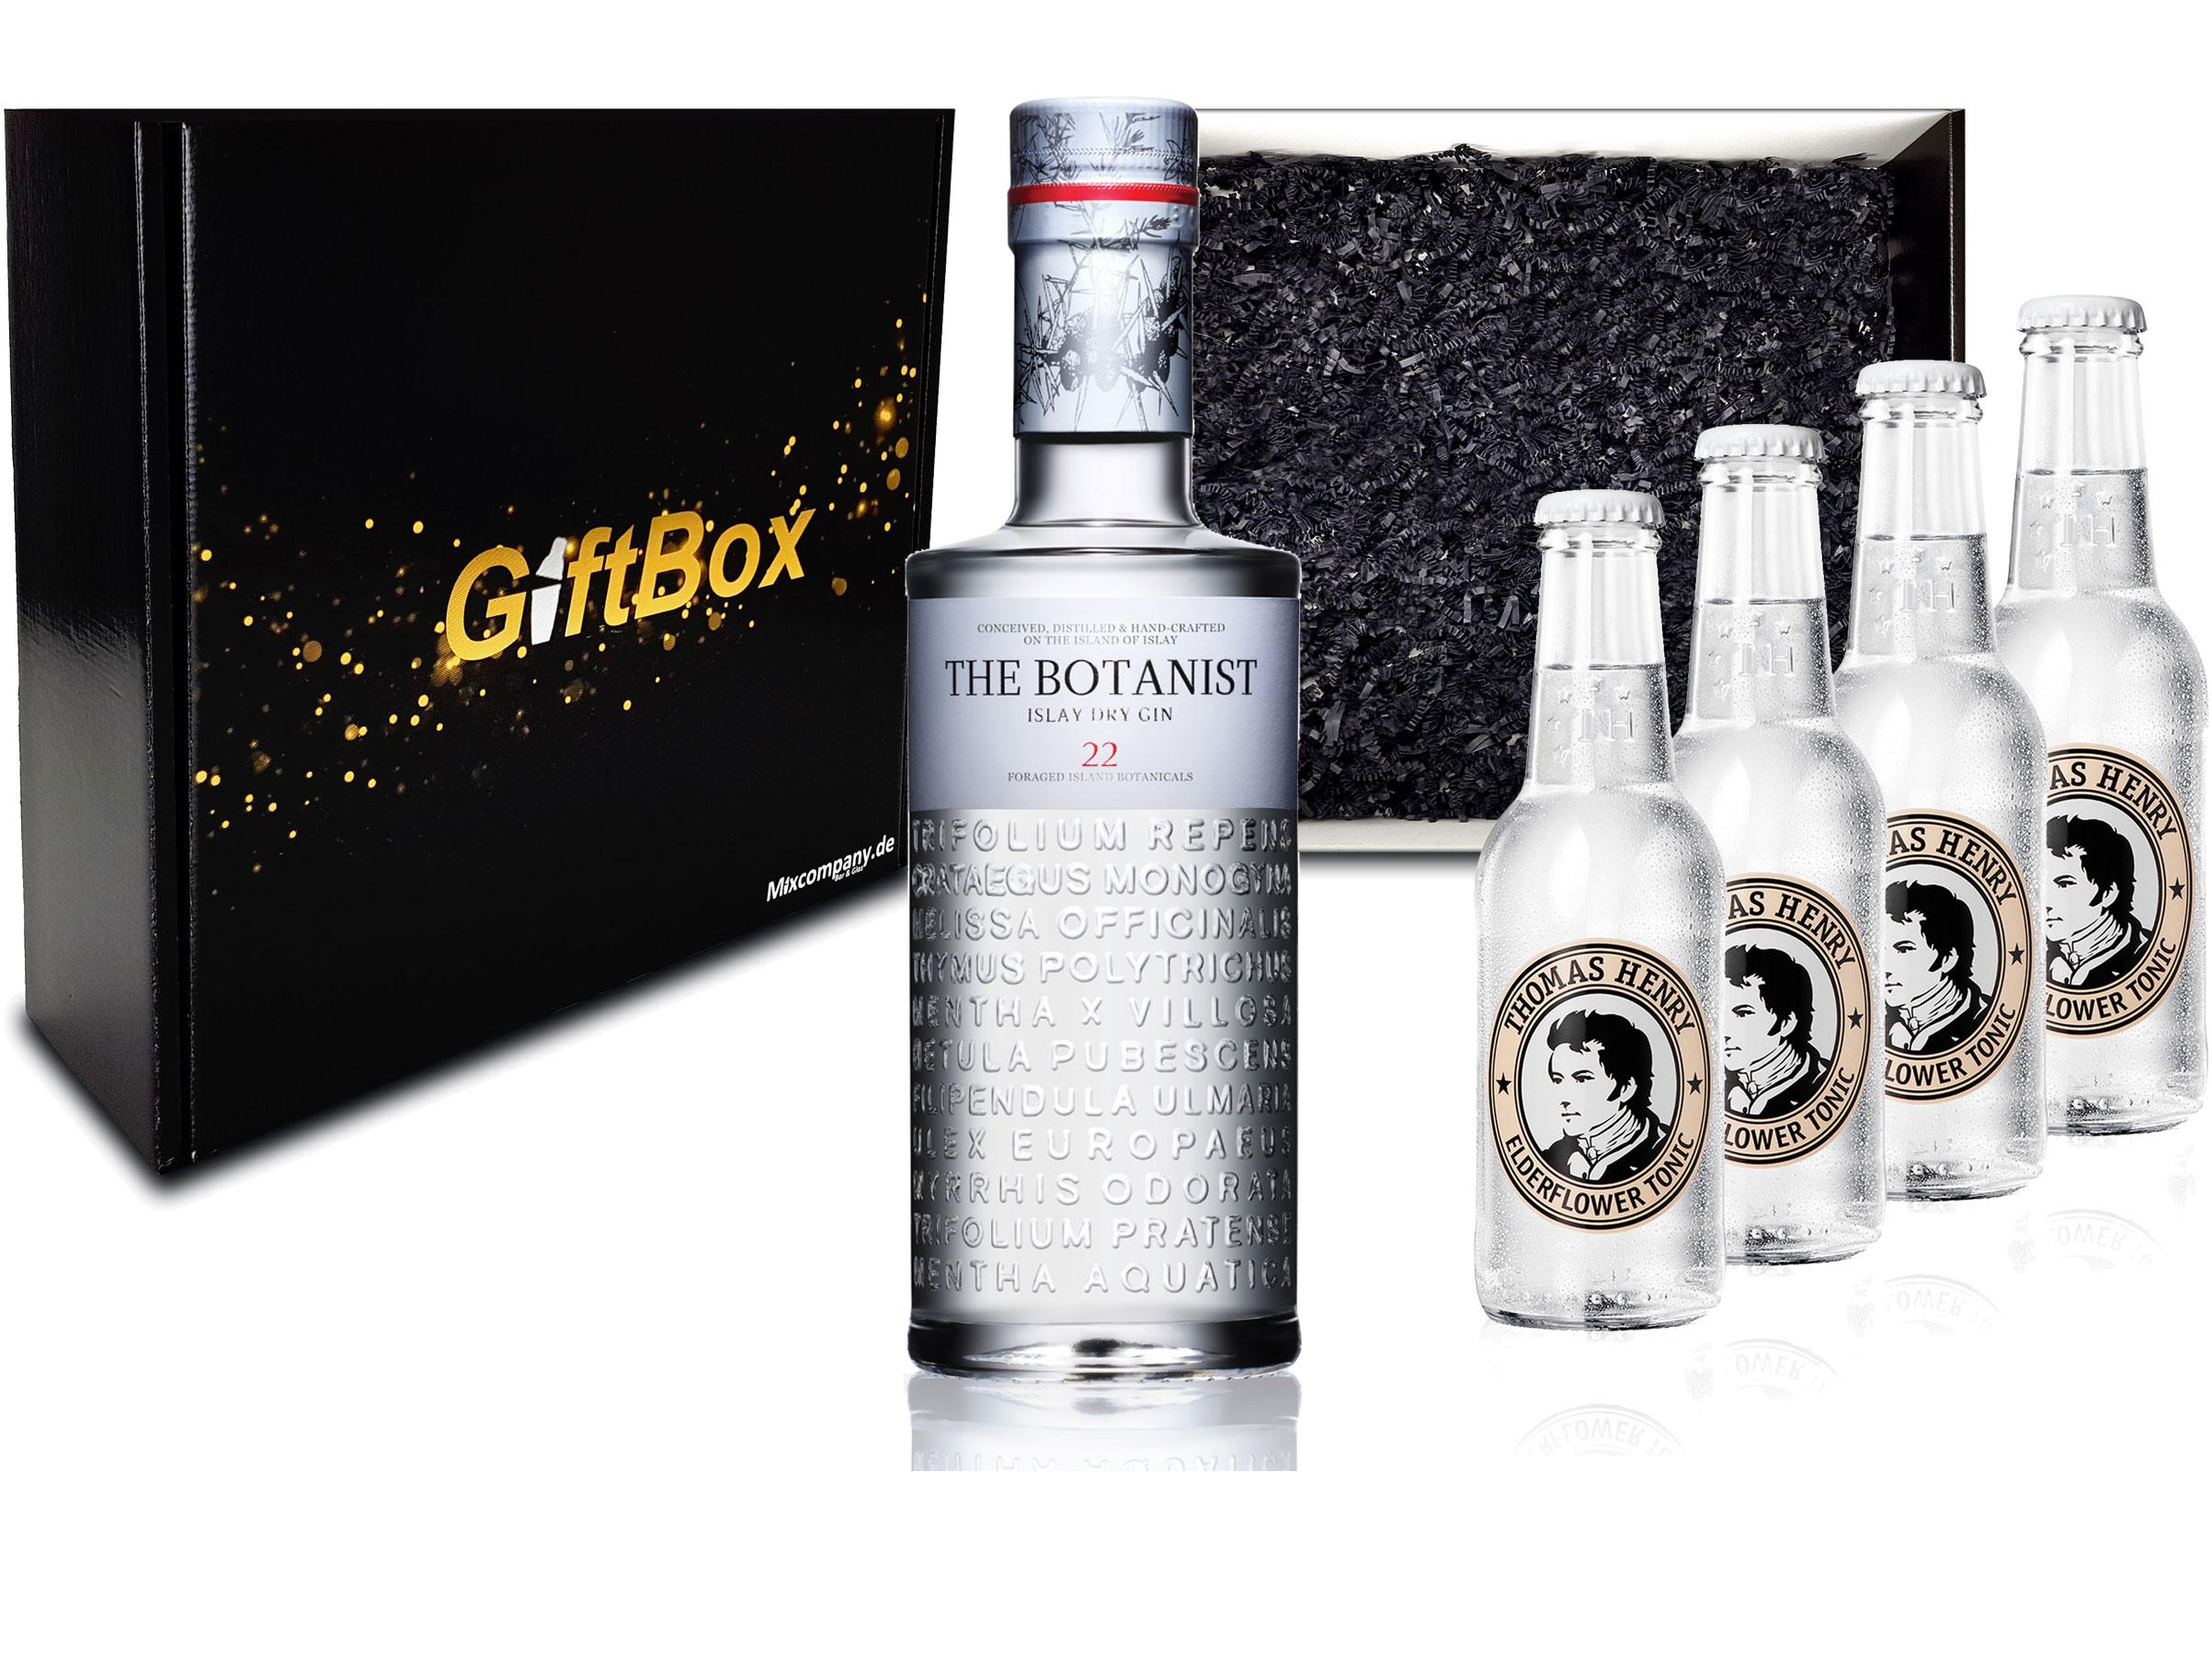 Gin Tonic Giftbox Geschenkset - The Botanist Islay Dry Gin 0,7l 700ml (46% Vol) + 4x Thomas Henry Elderflower Tonic Water 200ml inkl. Pfand MEHRWEG + Geschenkverpackung